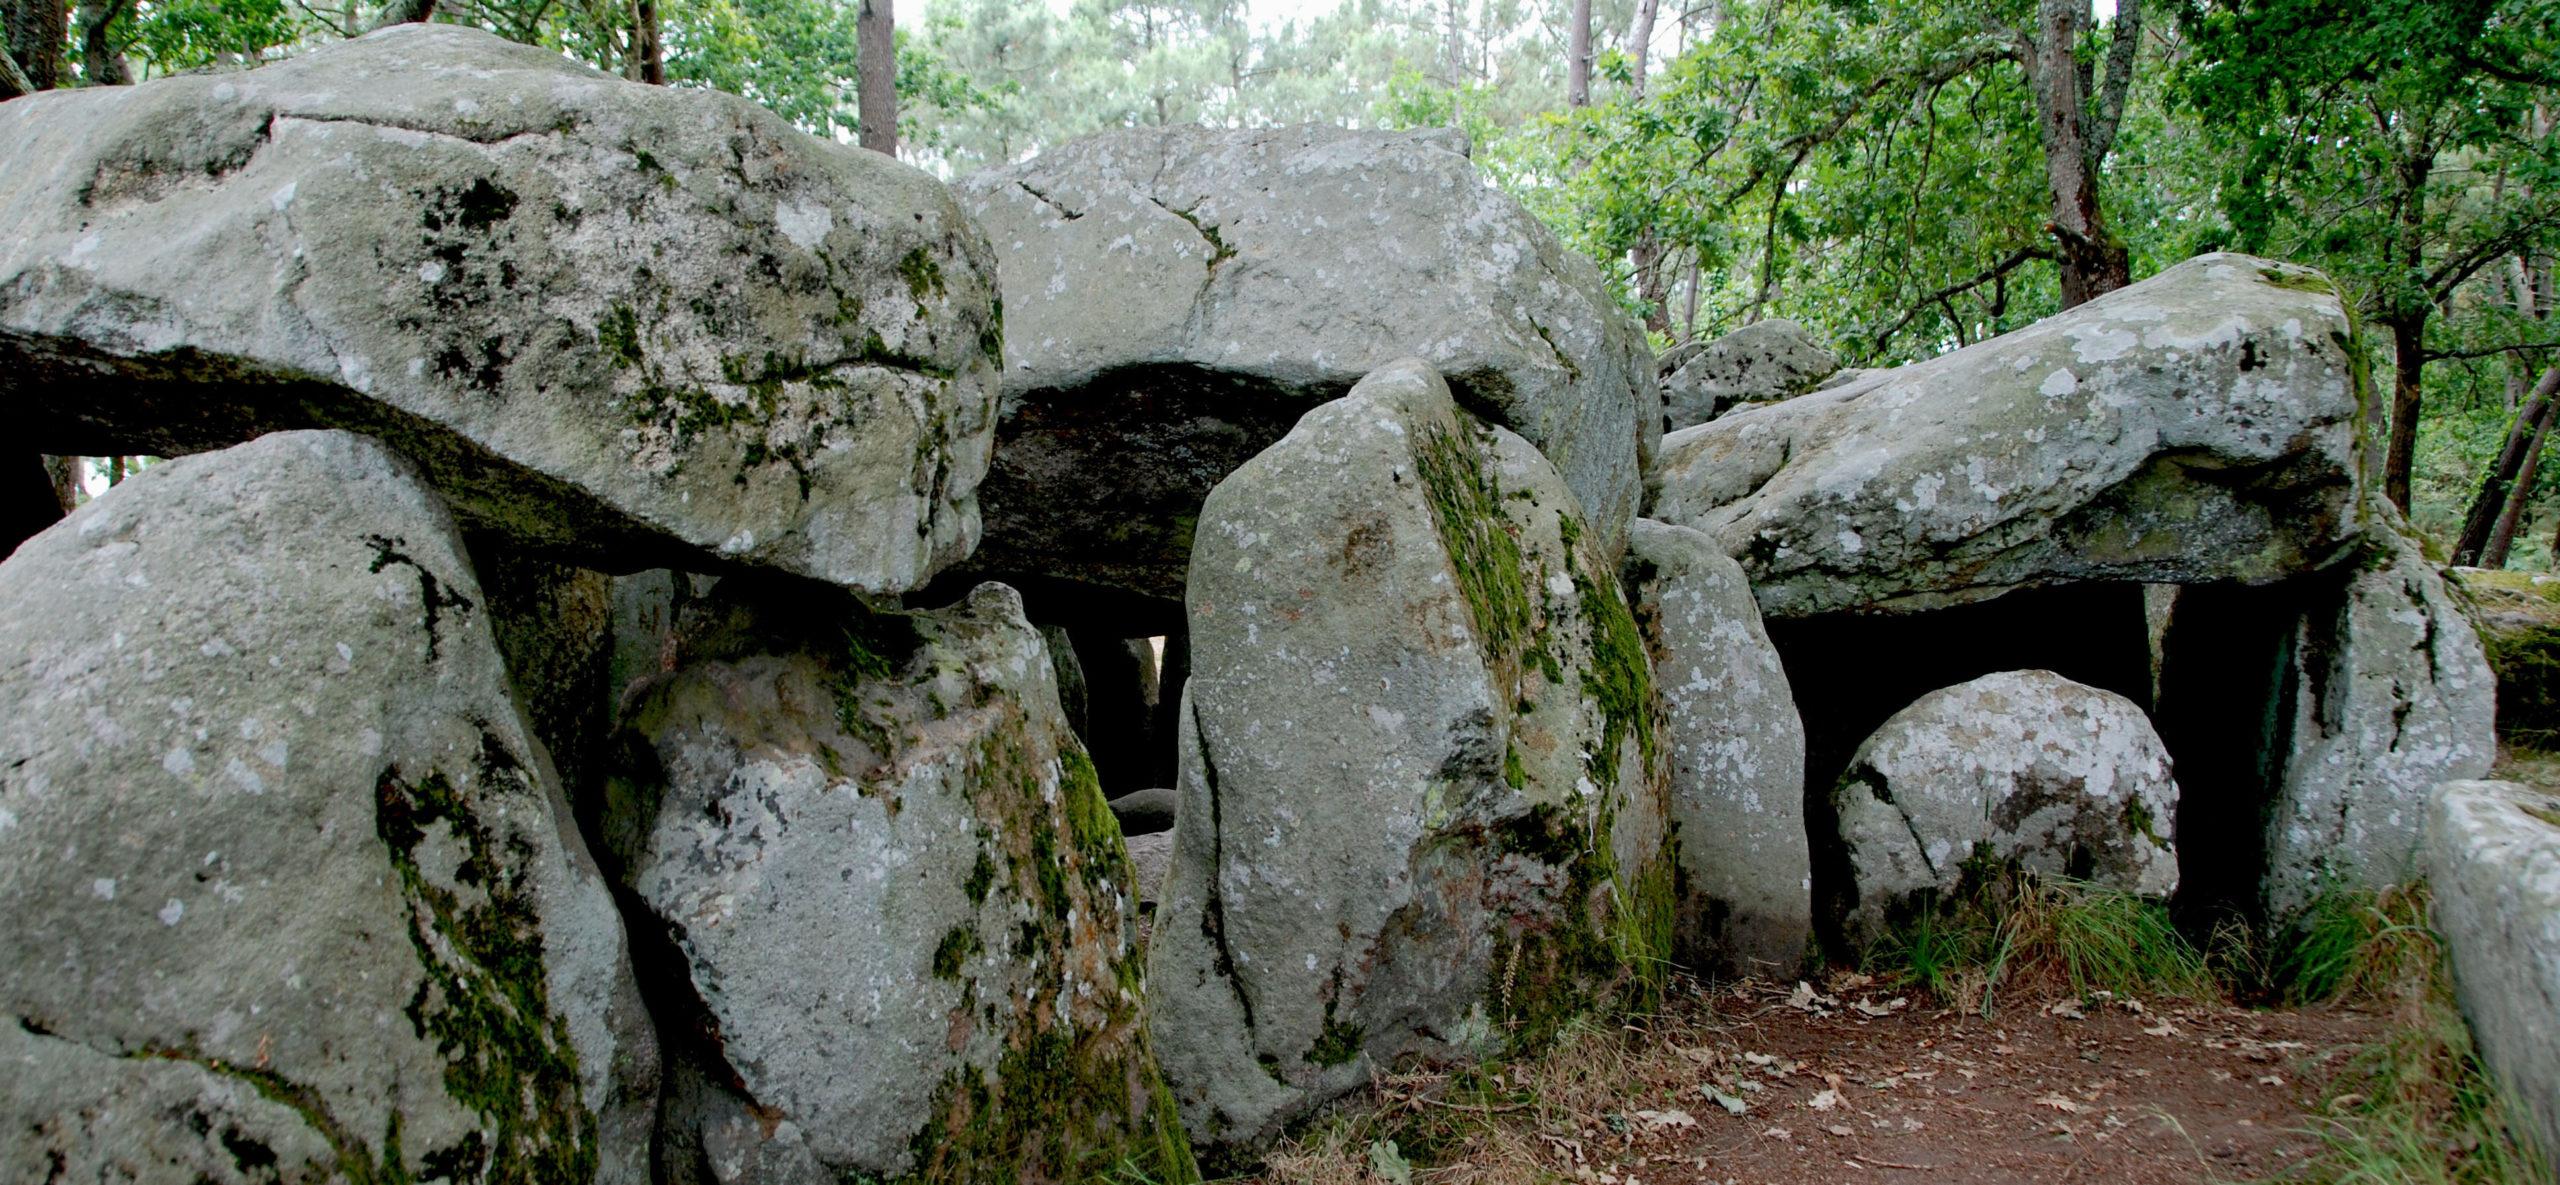 Menhirs, dolmen, alignements